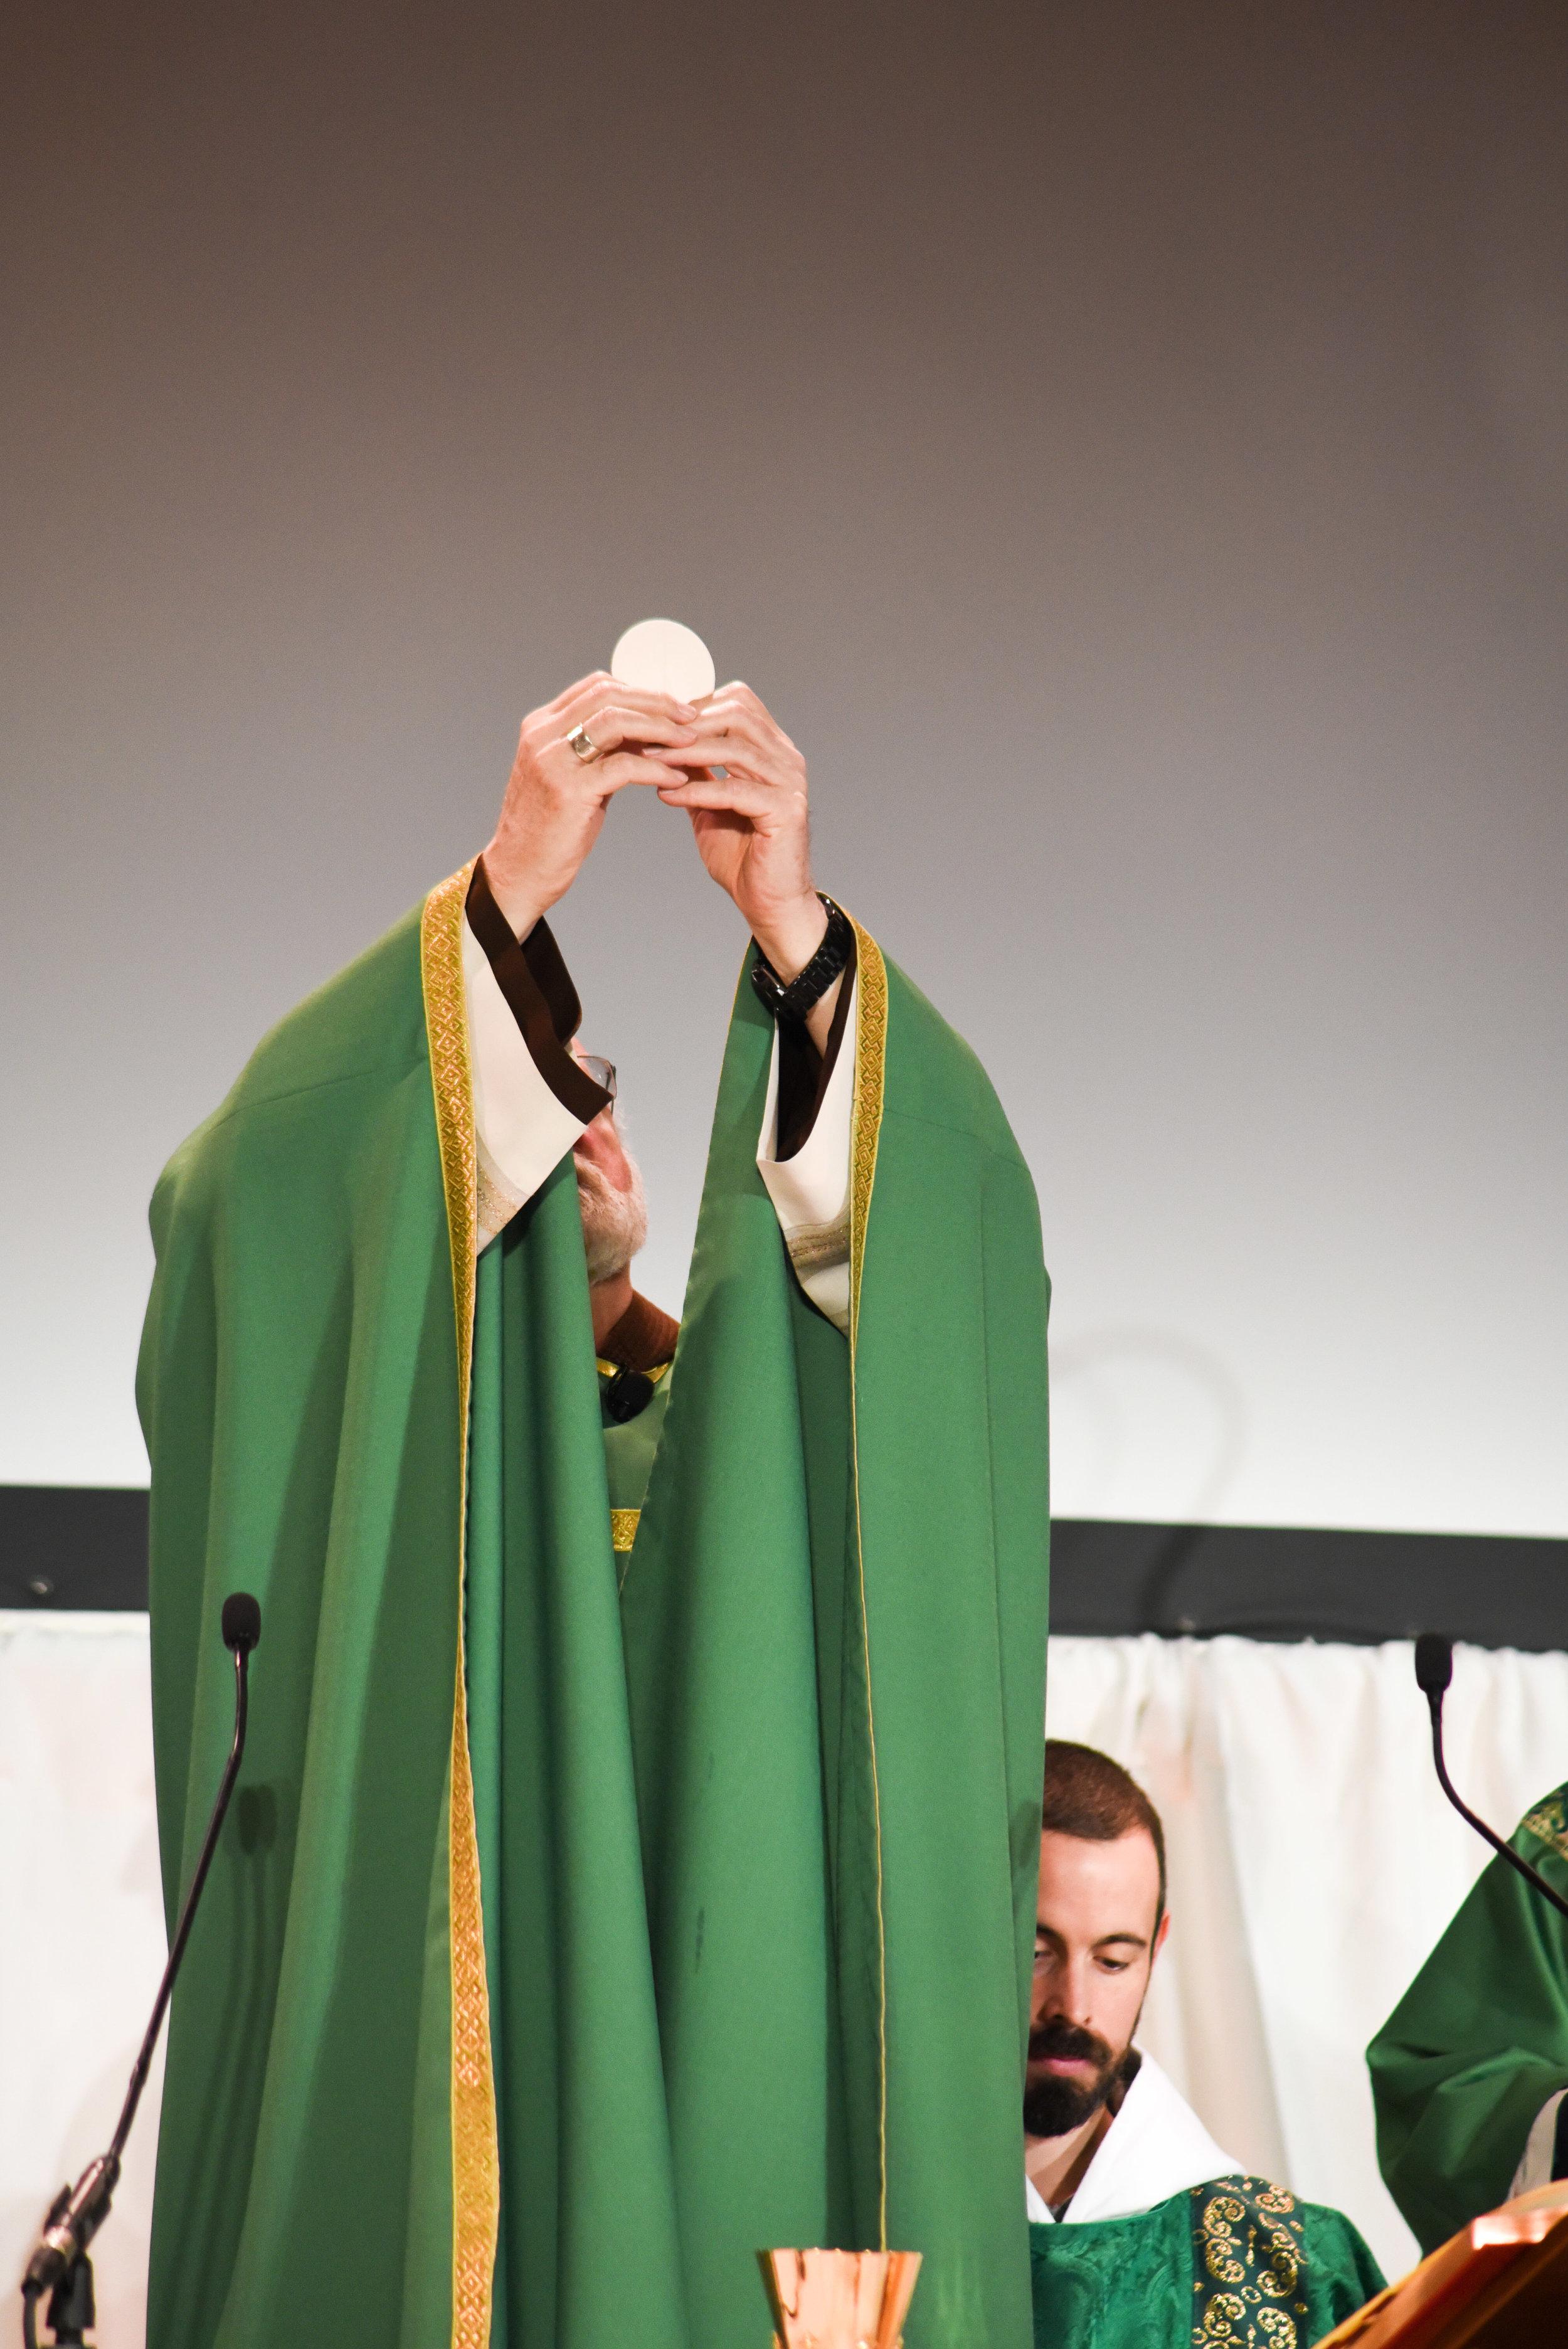 holy-mass-celebrated-by-sen-cardinal-patrick-omalley-ofm-cap-archbishop-of-boston_24824538067_o.jpg